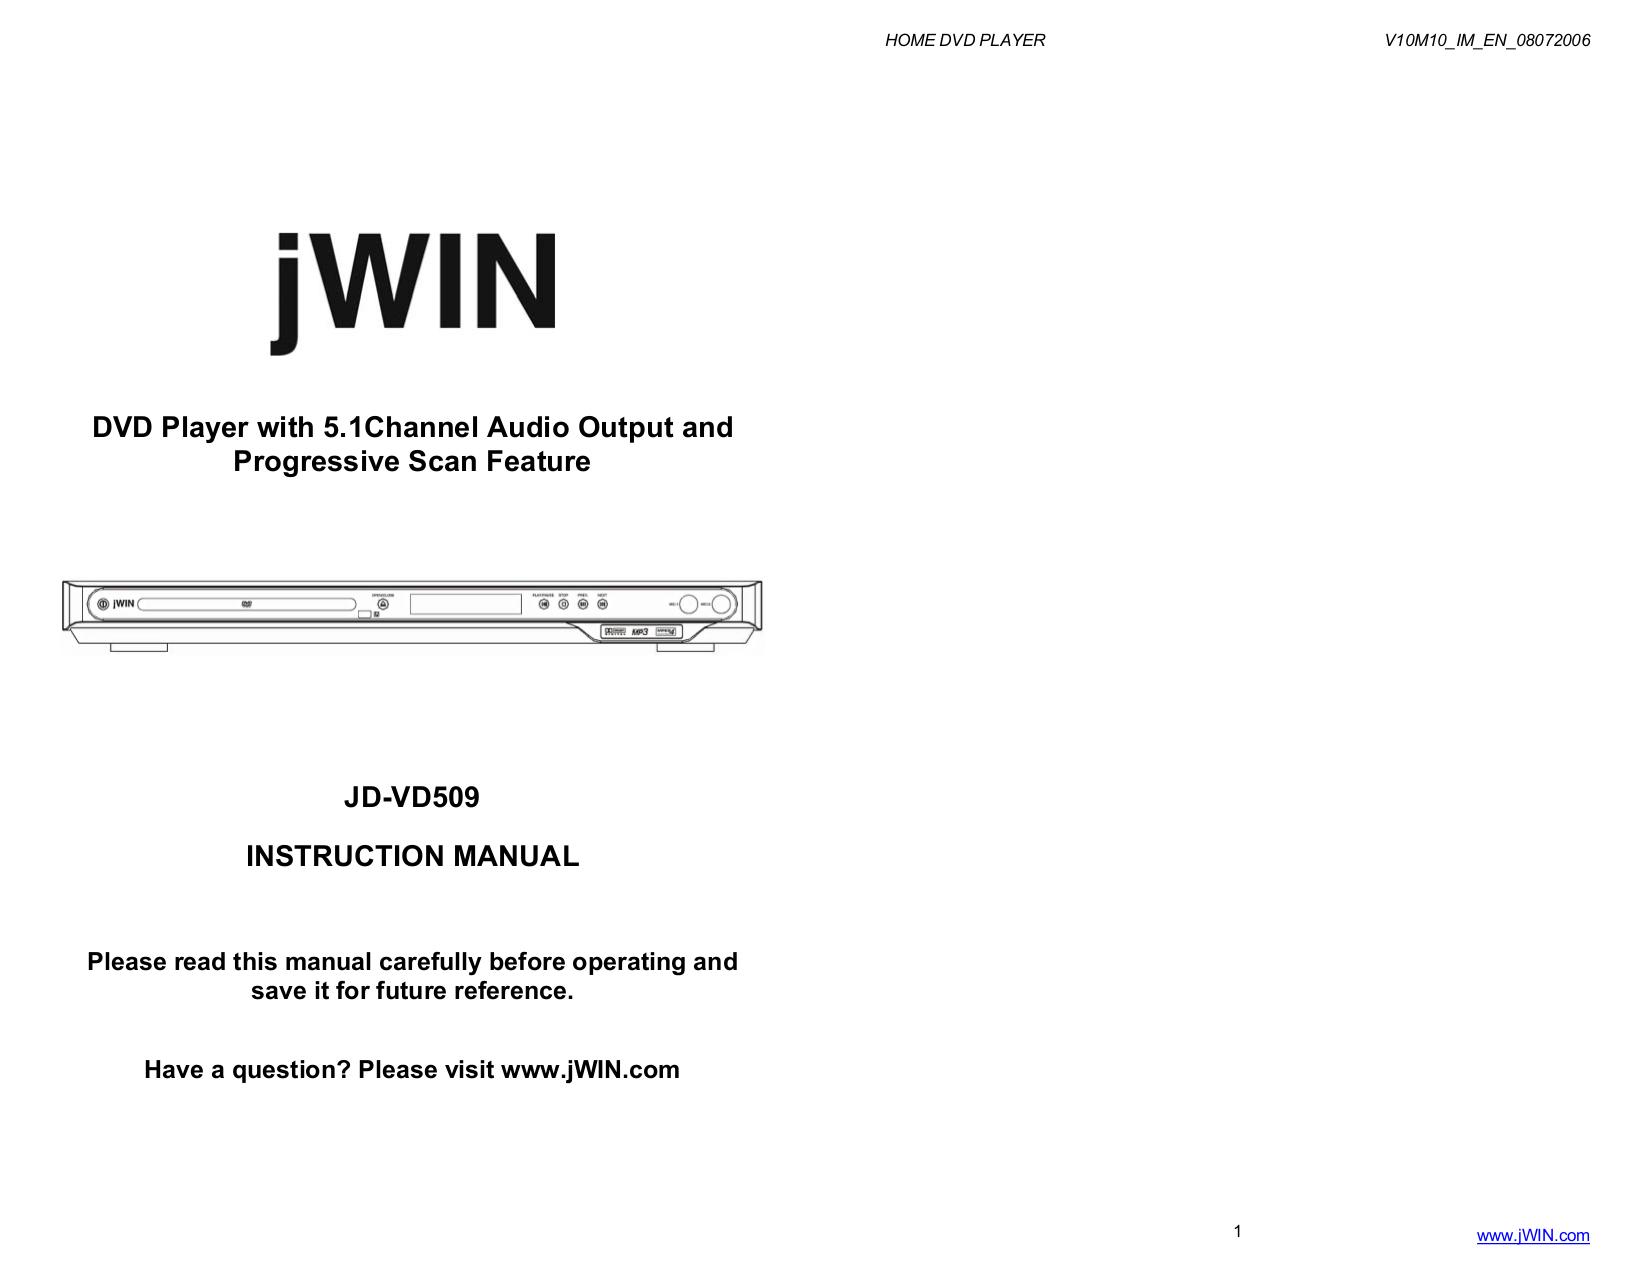 pdf for jWIN DVD Players JD-VD509 manual